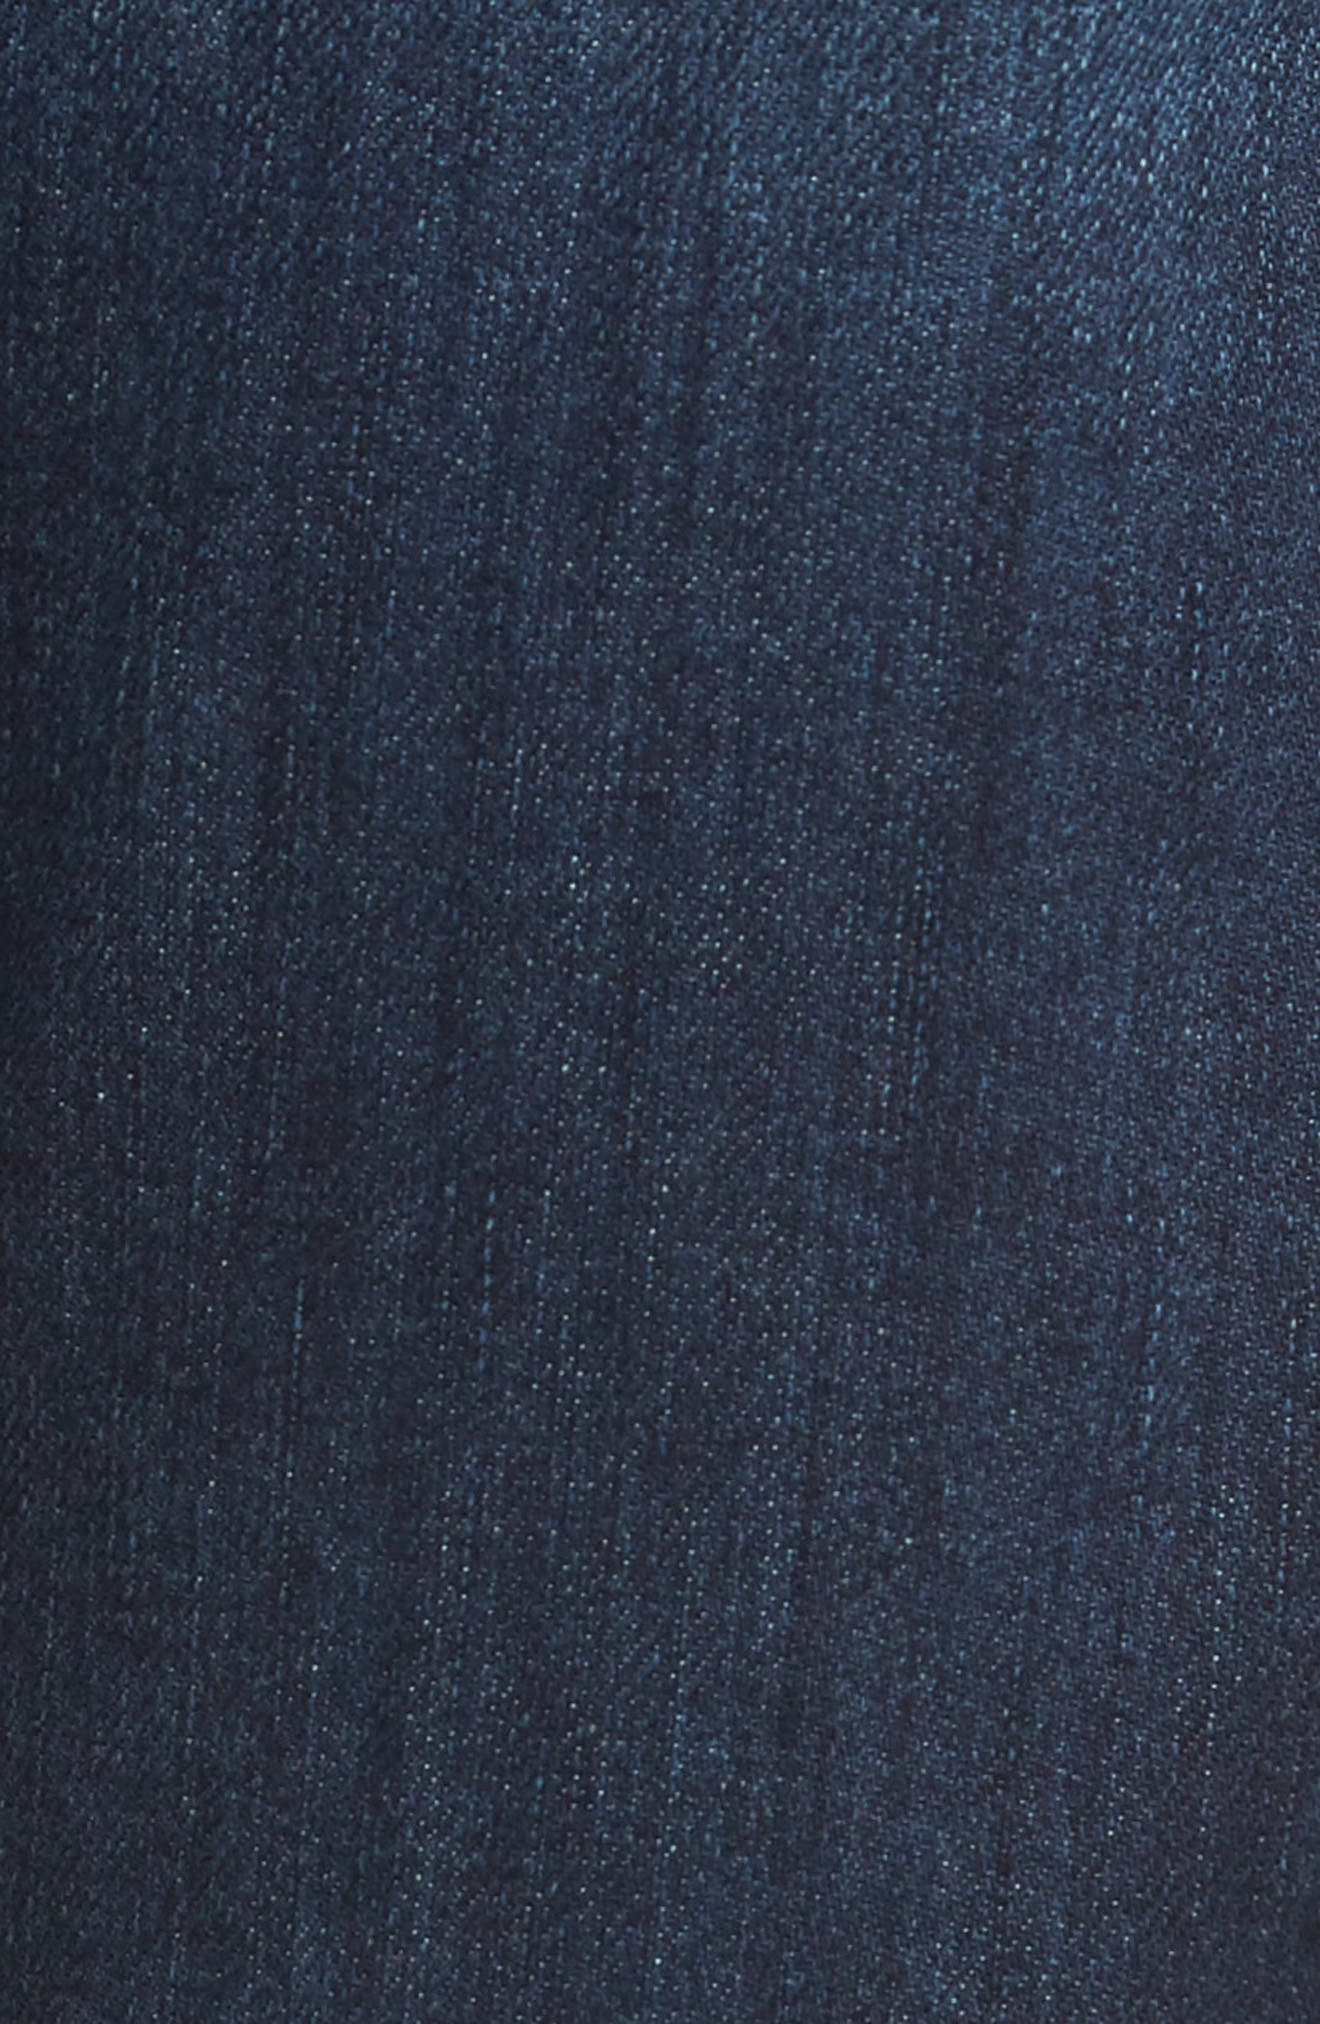 Luxe Standard Straight Leg Jeans,                             Alternate thumbnail 5, color,                             Desperado